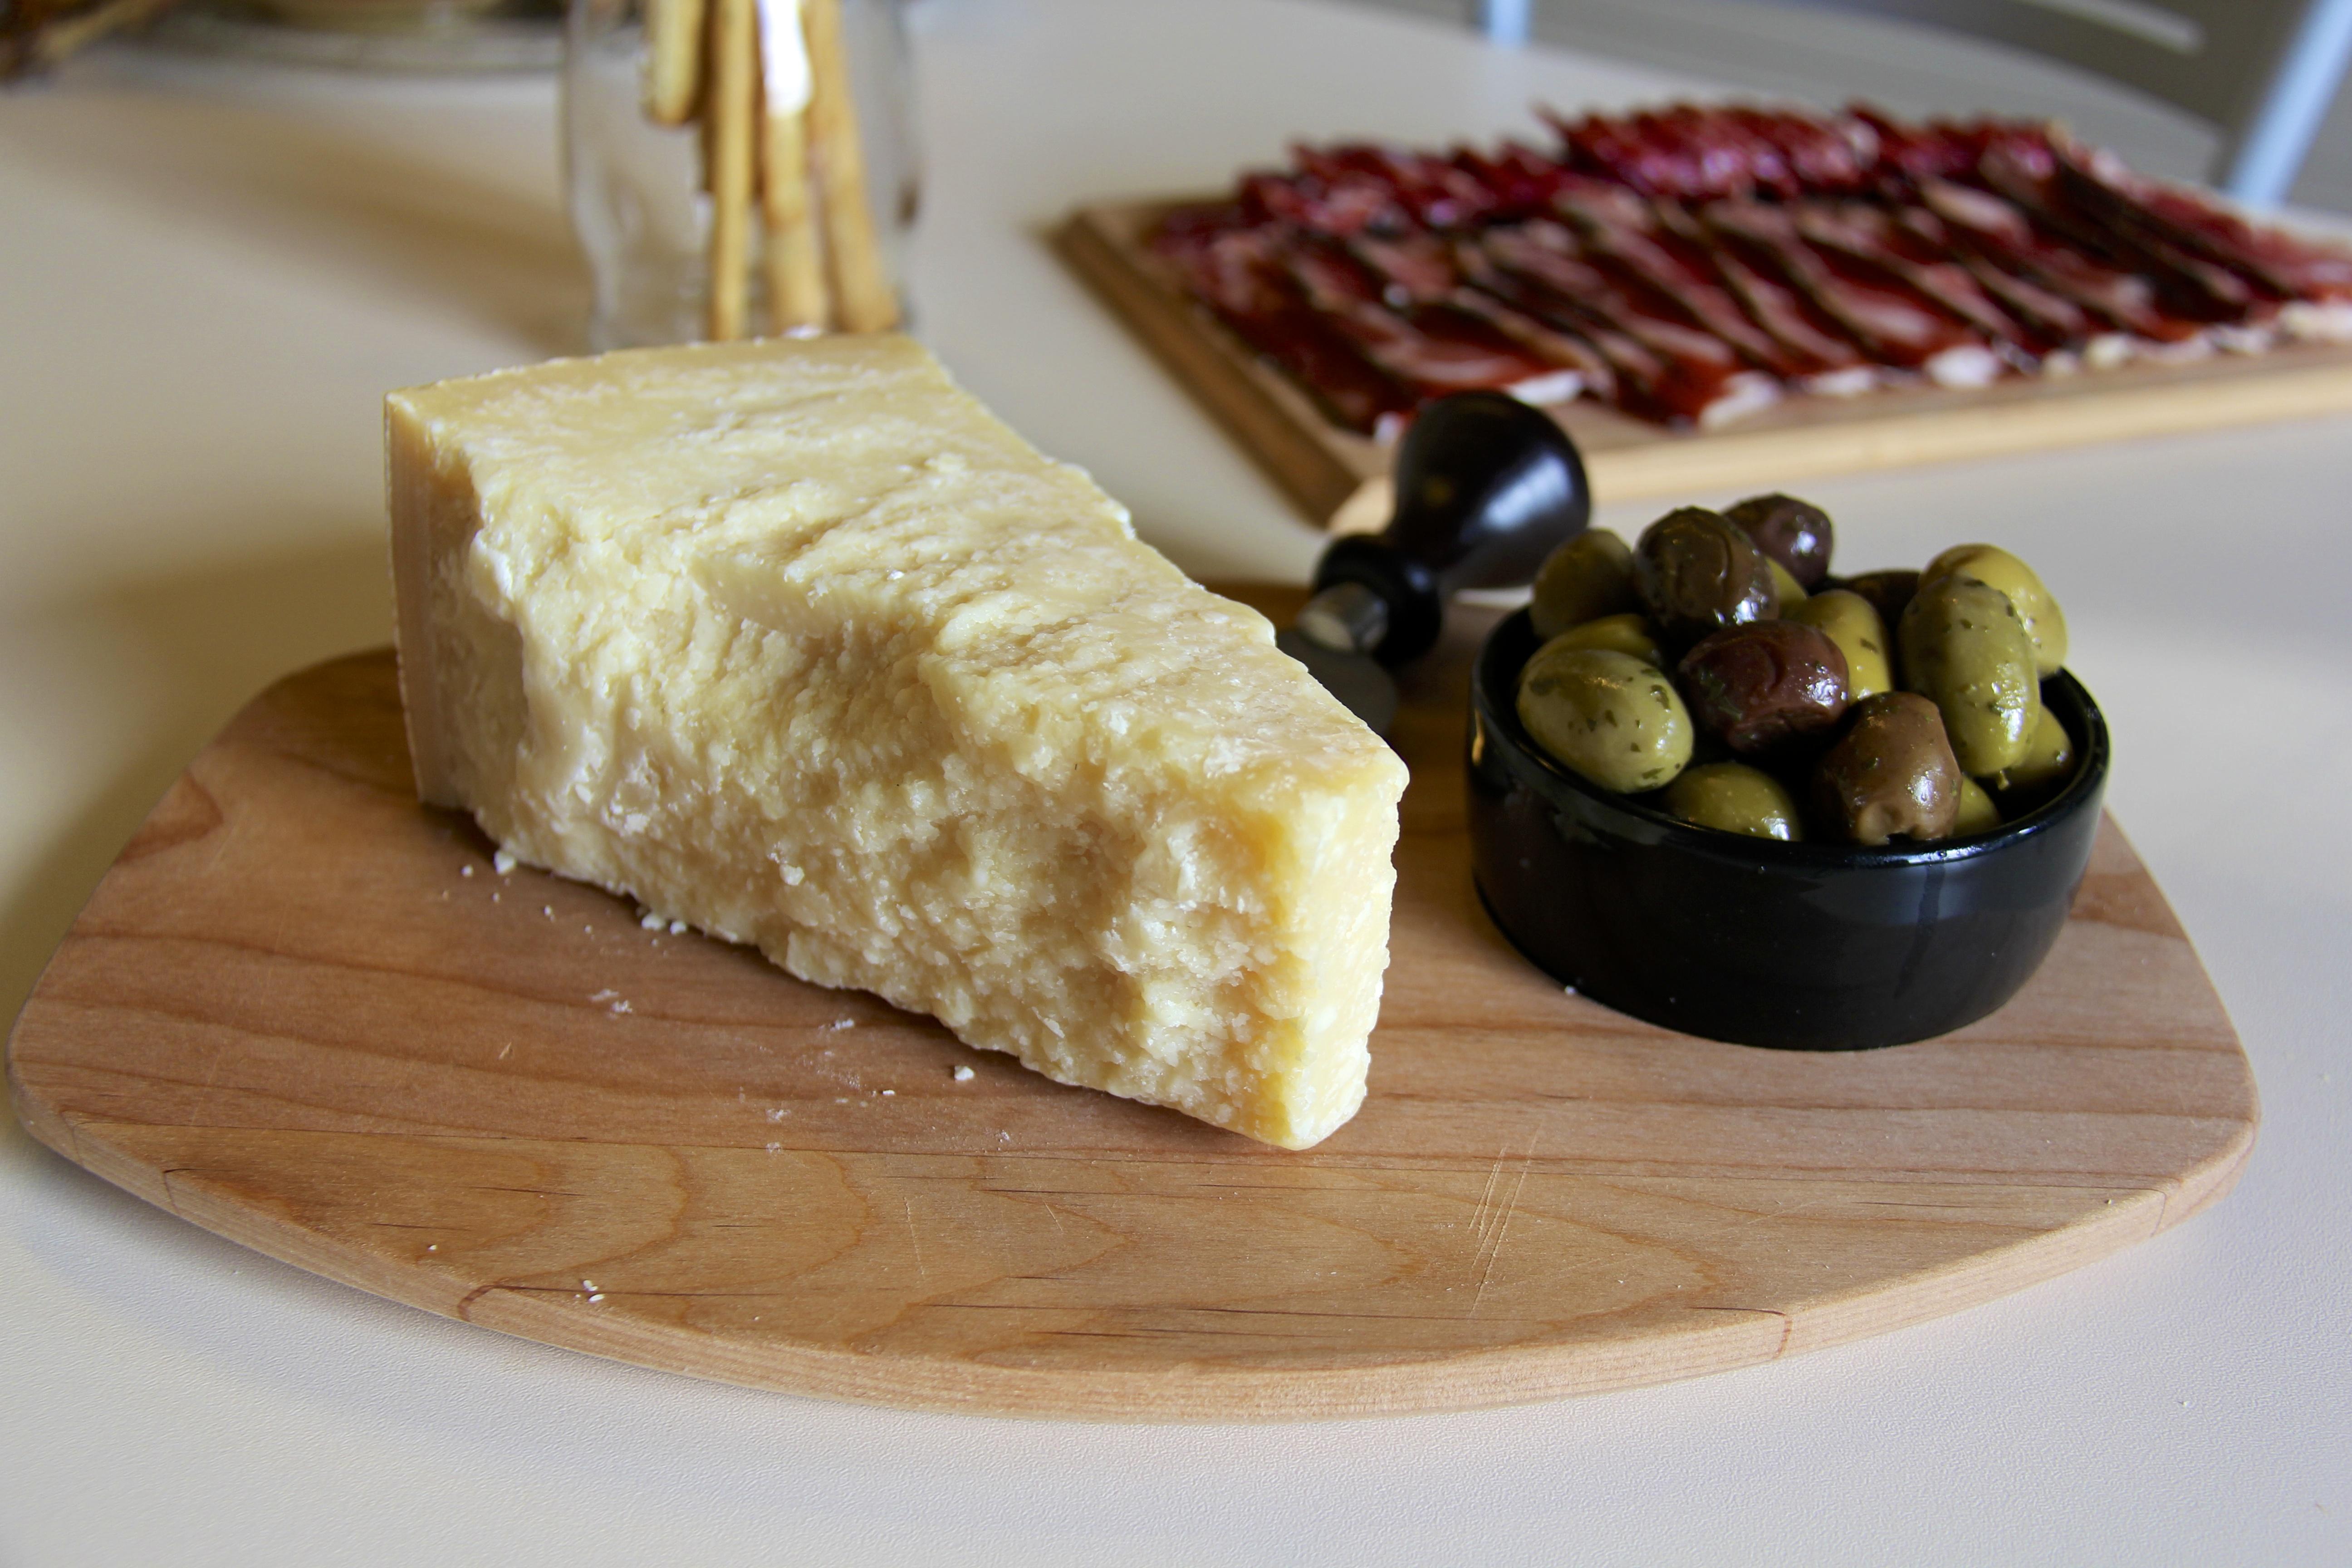 Italian Antipasti (Parmigiano and Olives)